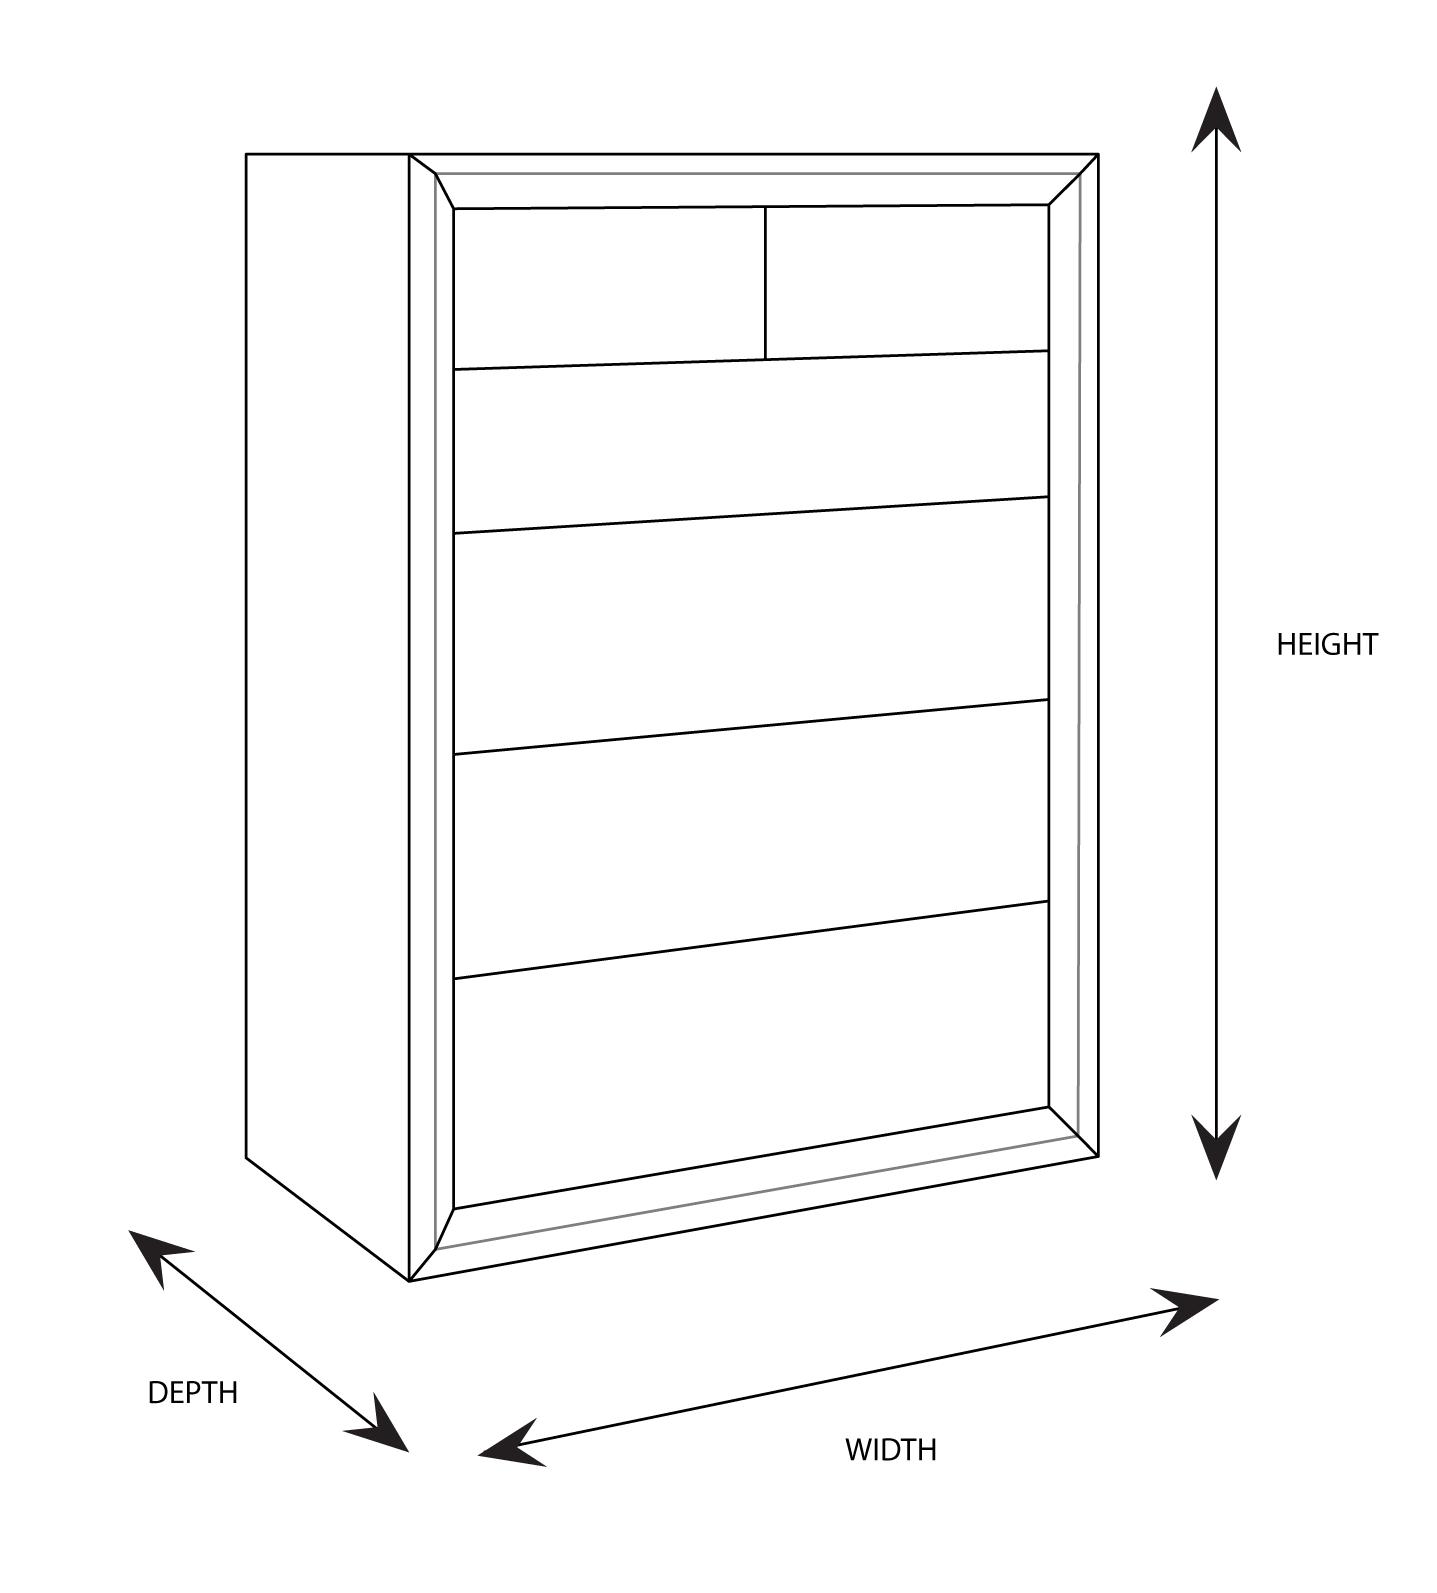 Clempton Tallboy Dimensional Drawing